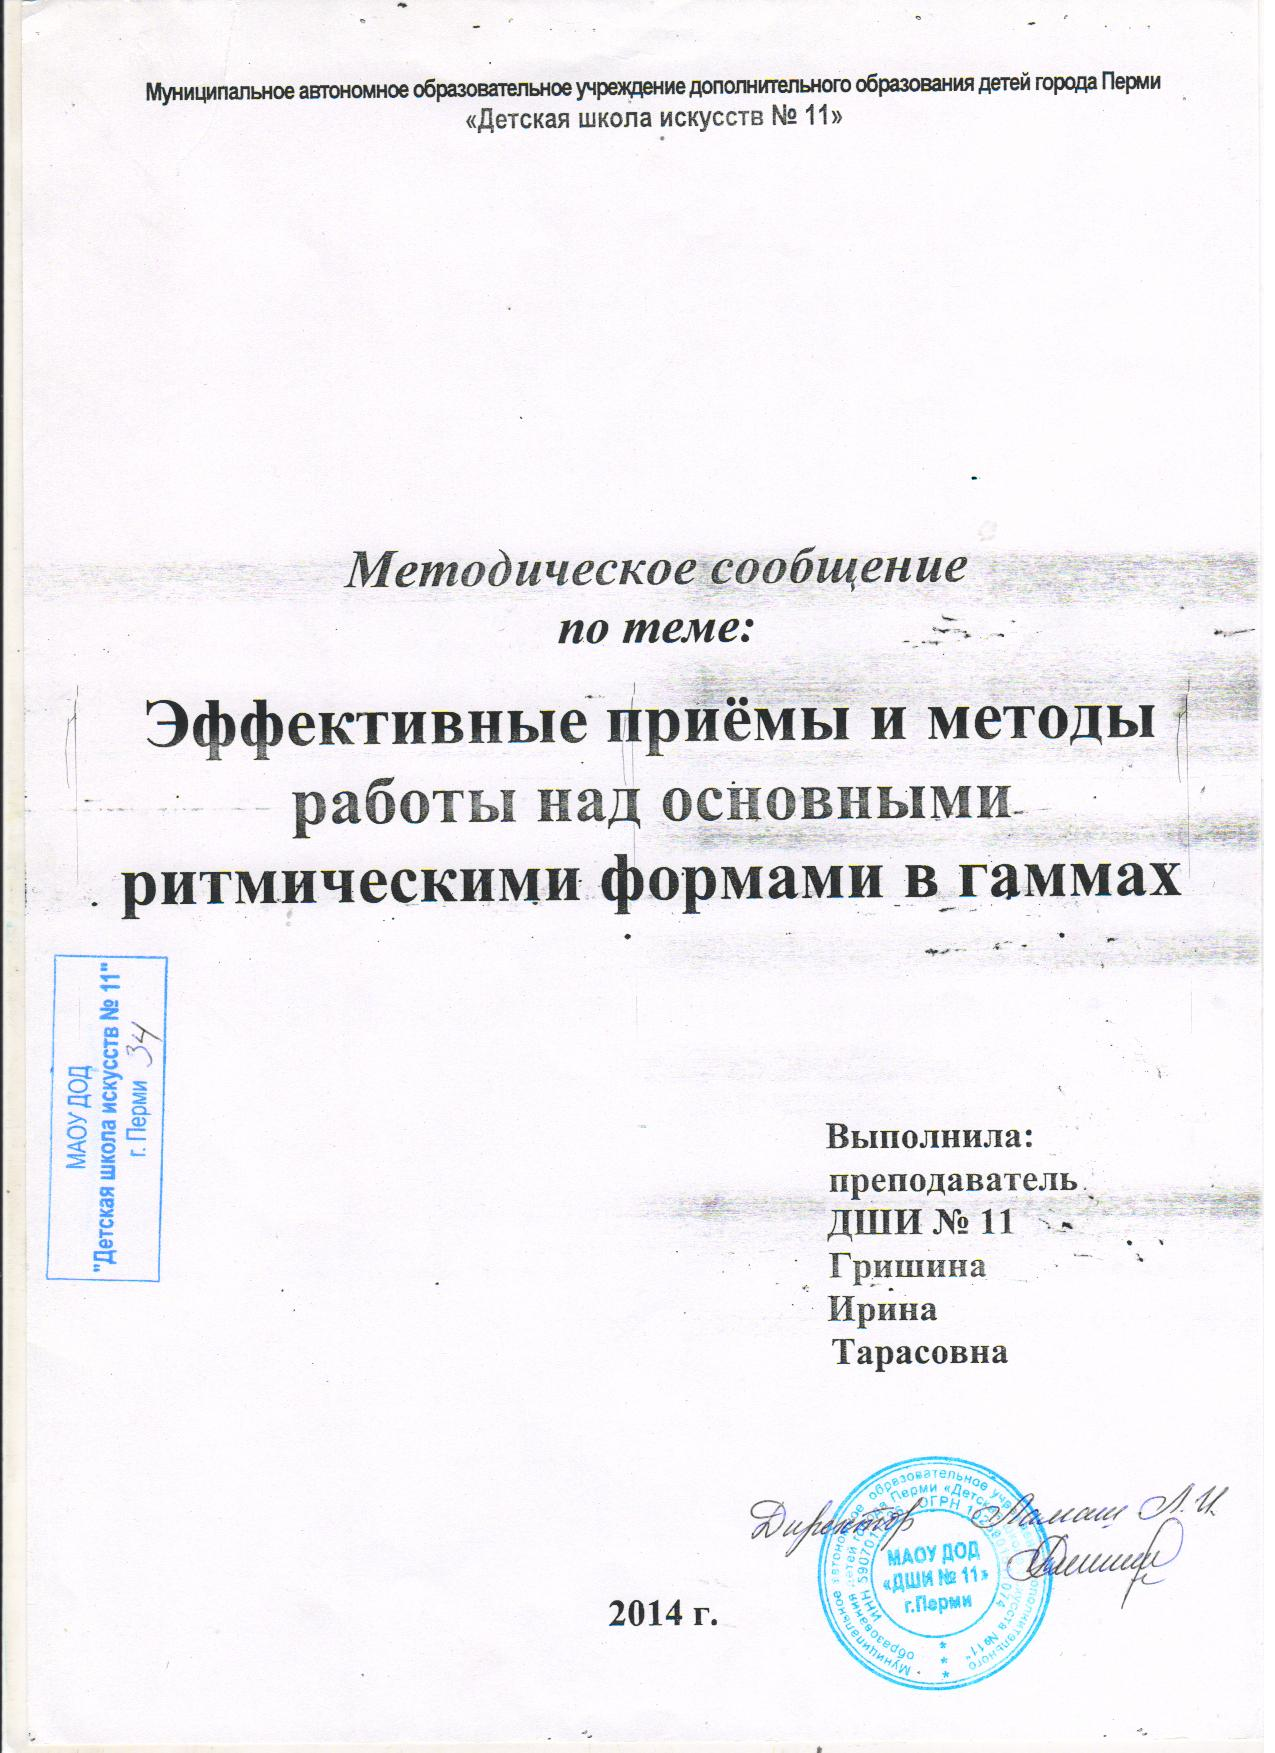 C:\Documents and Settings\Учитель\Рабочий стол\гаммы 1.jpg